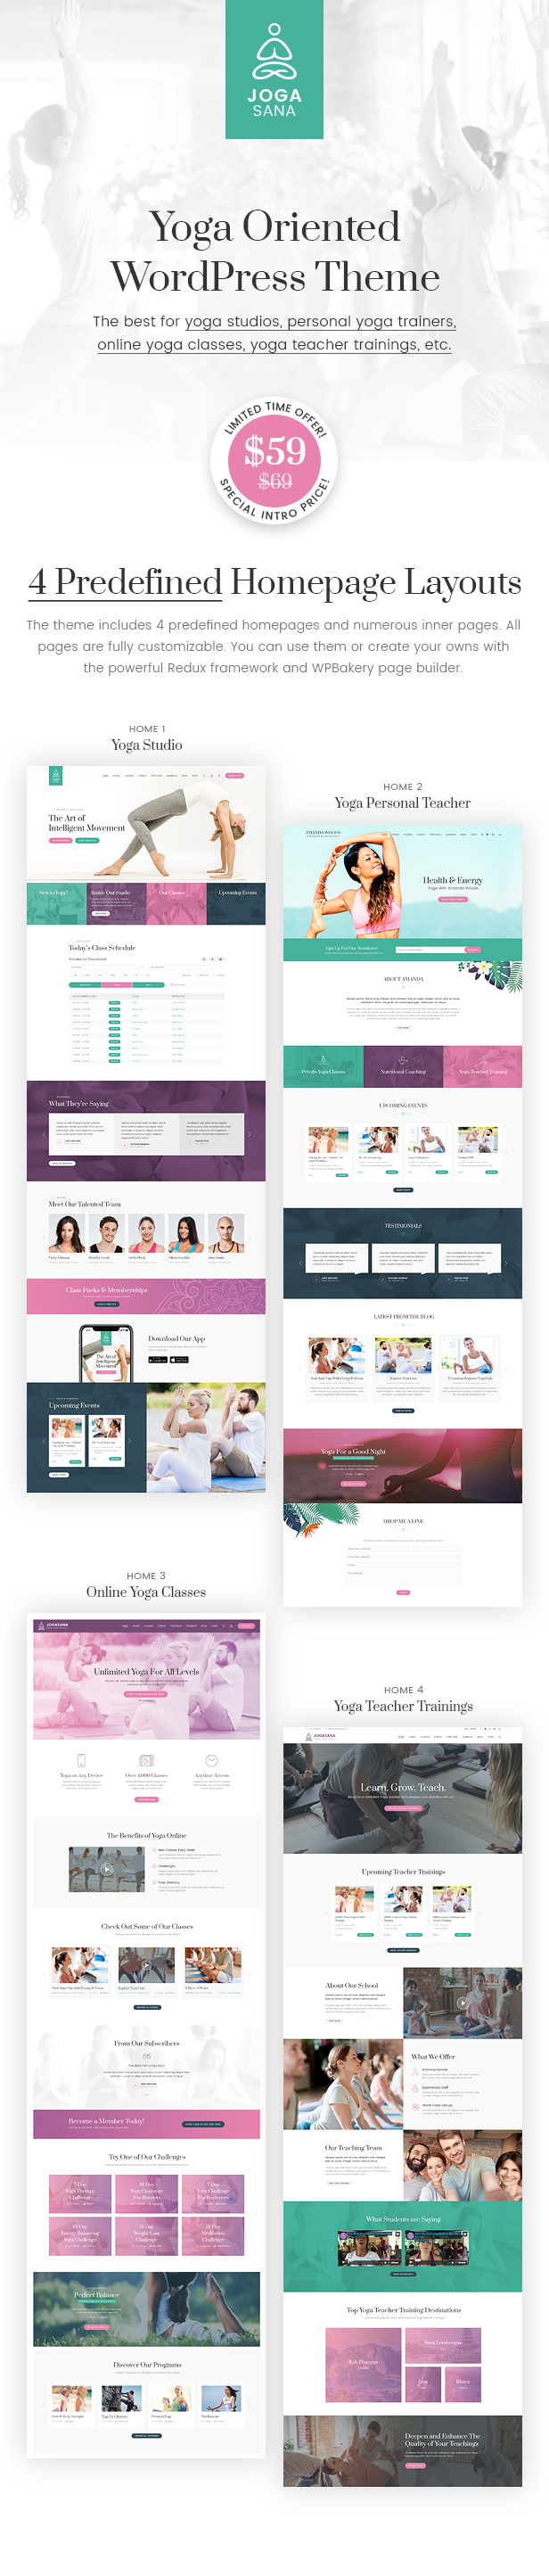 Jogasana - Yoga Oriented WordPress Theme - 1  Download Jogasana – Yoga Oriented WordPress Theme nulled preview01